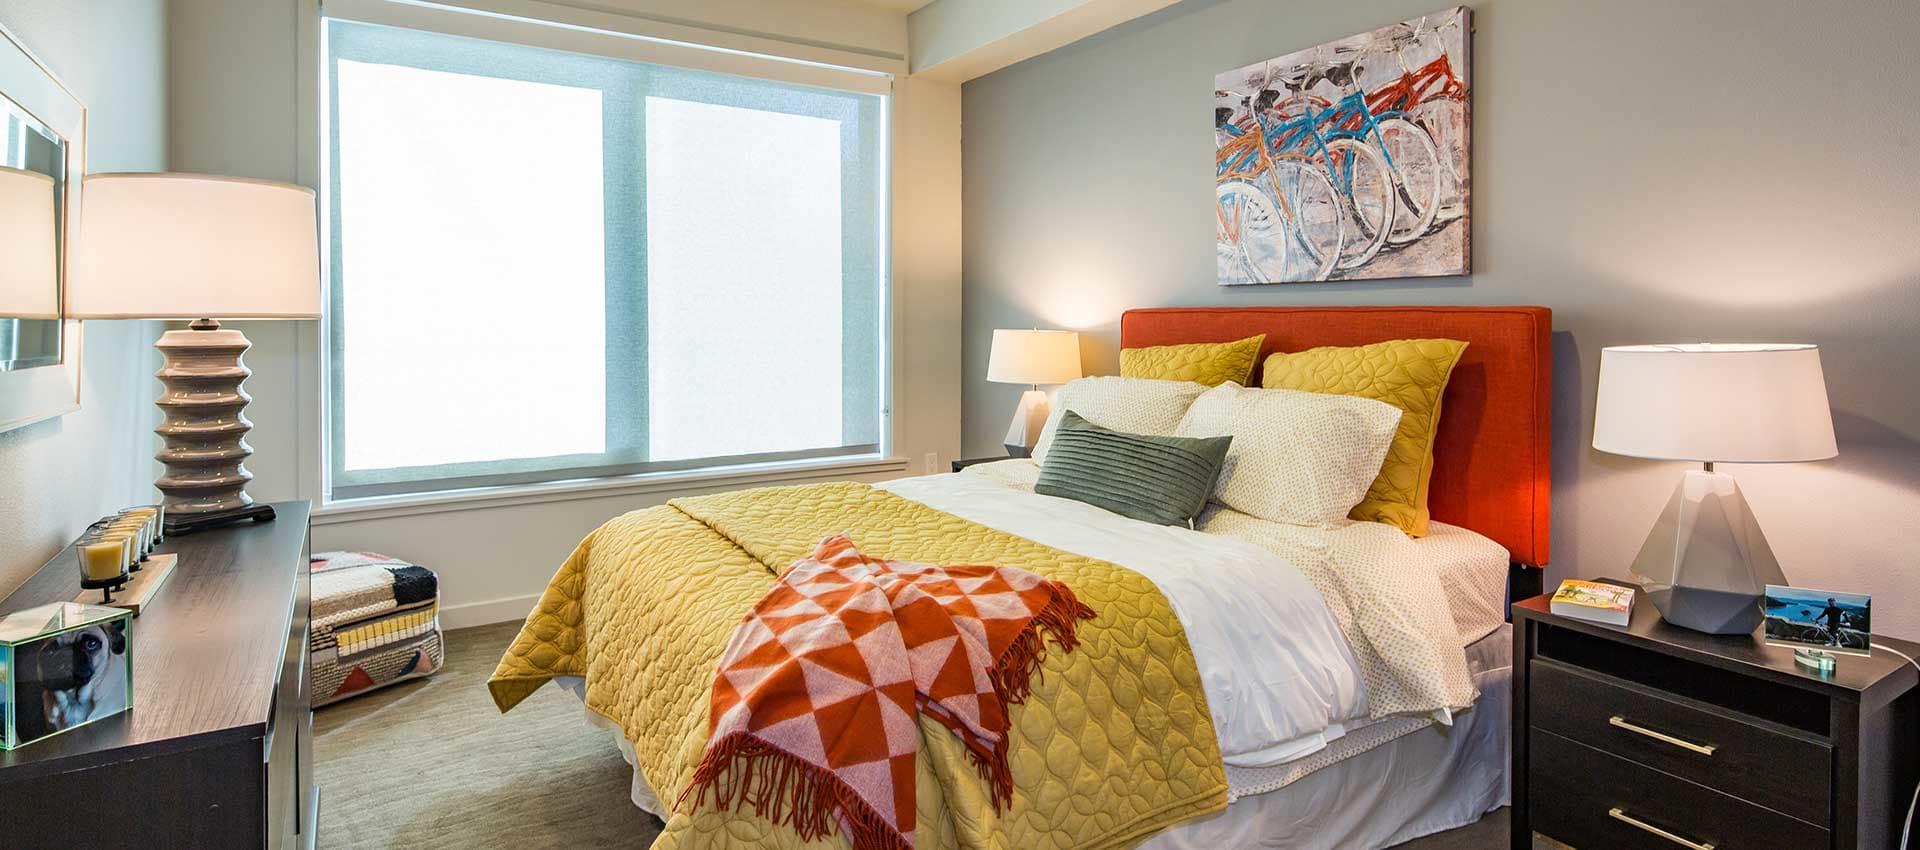 Bedroom at EVIVA Midtown